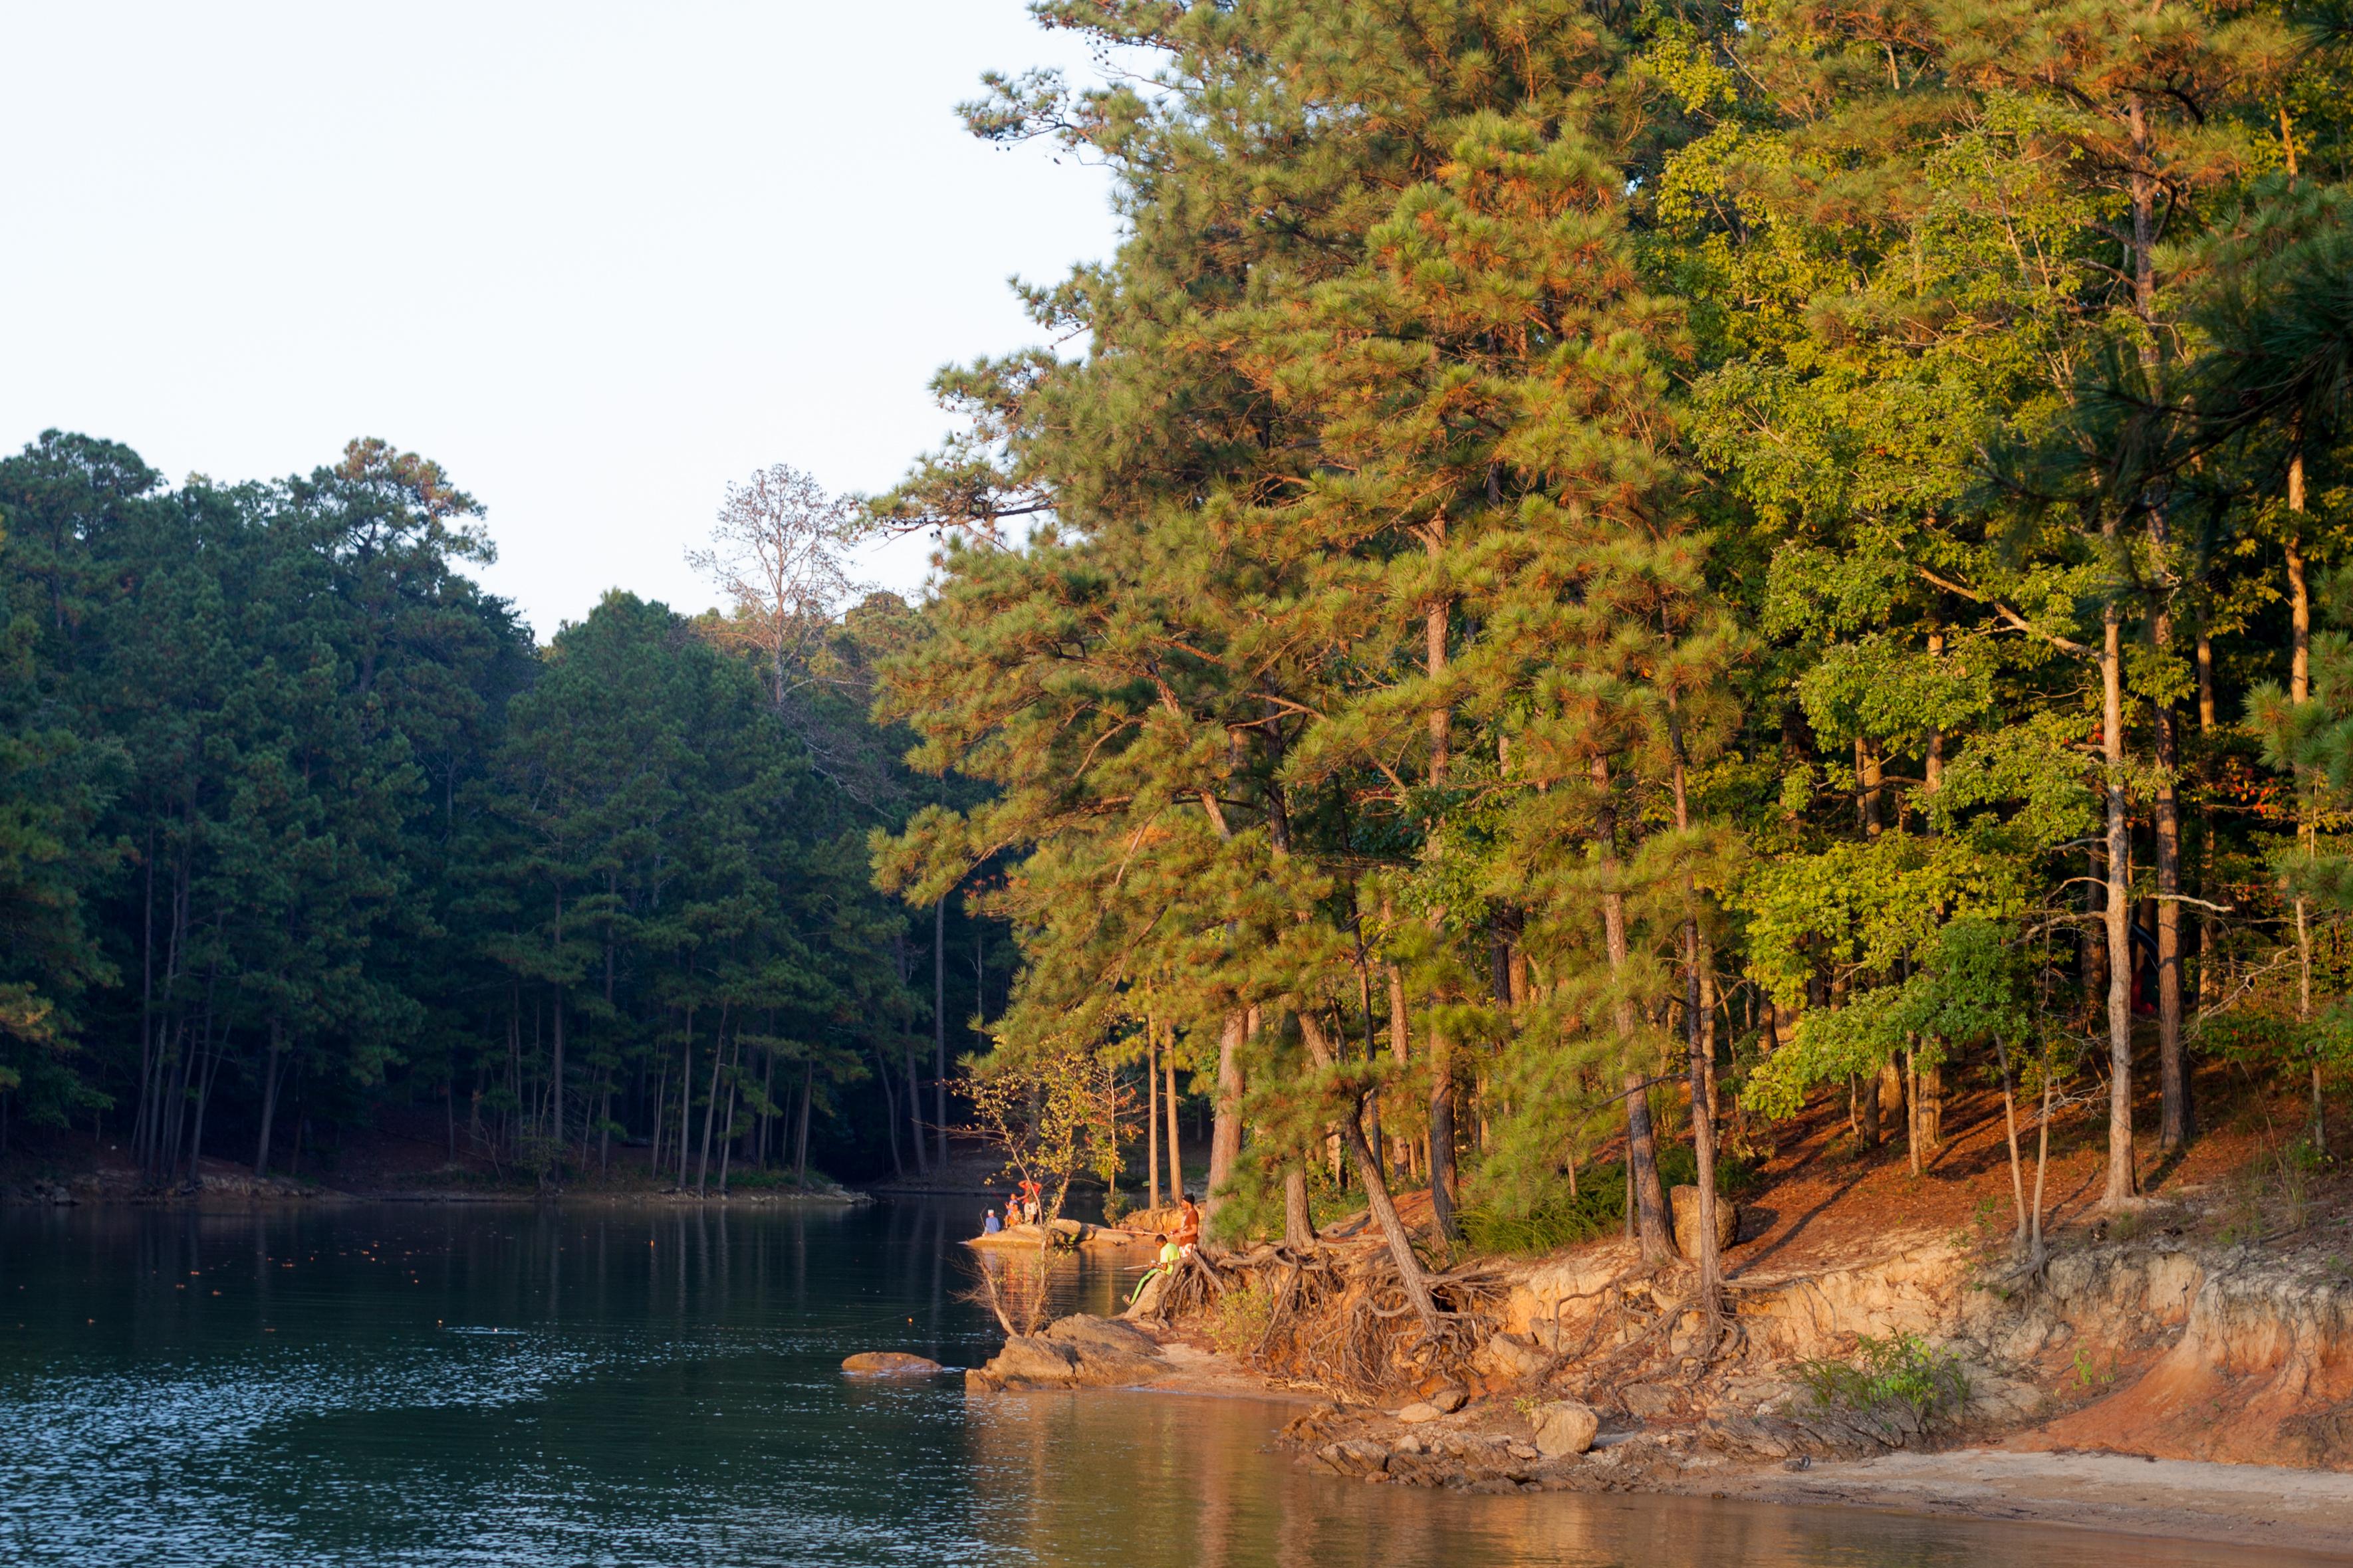 Fishing at Red Top Mountain, Georgia.